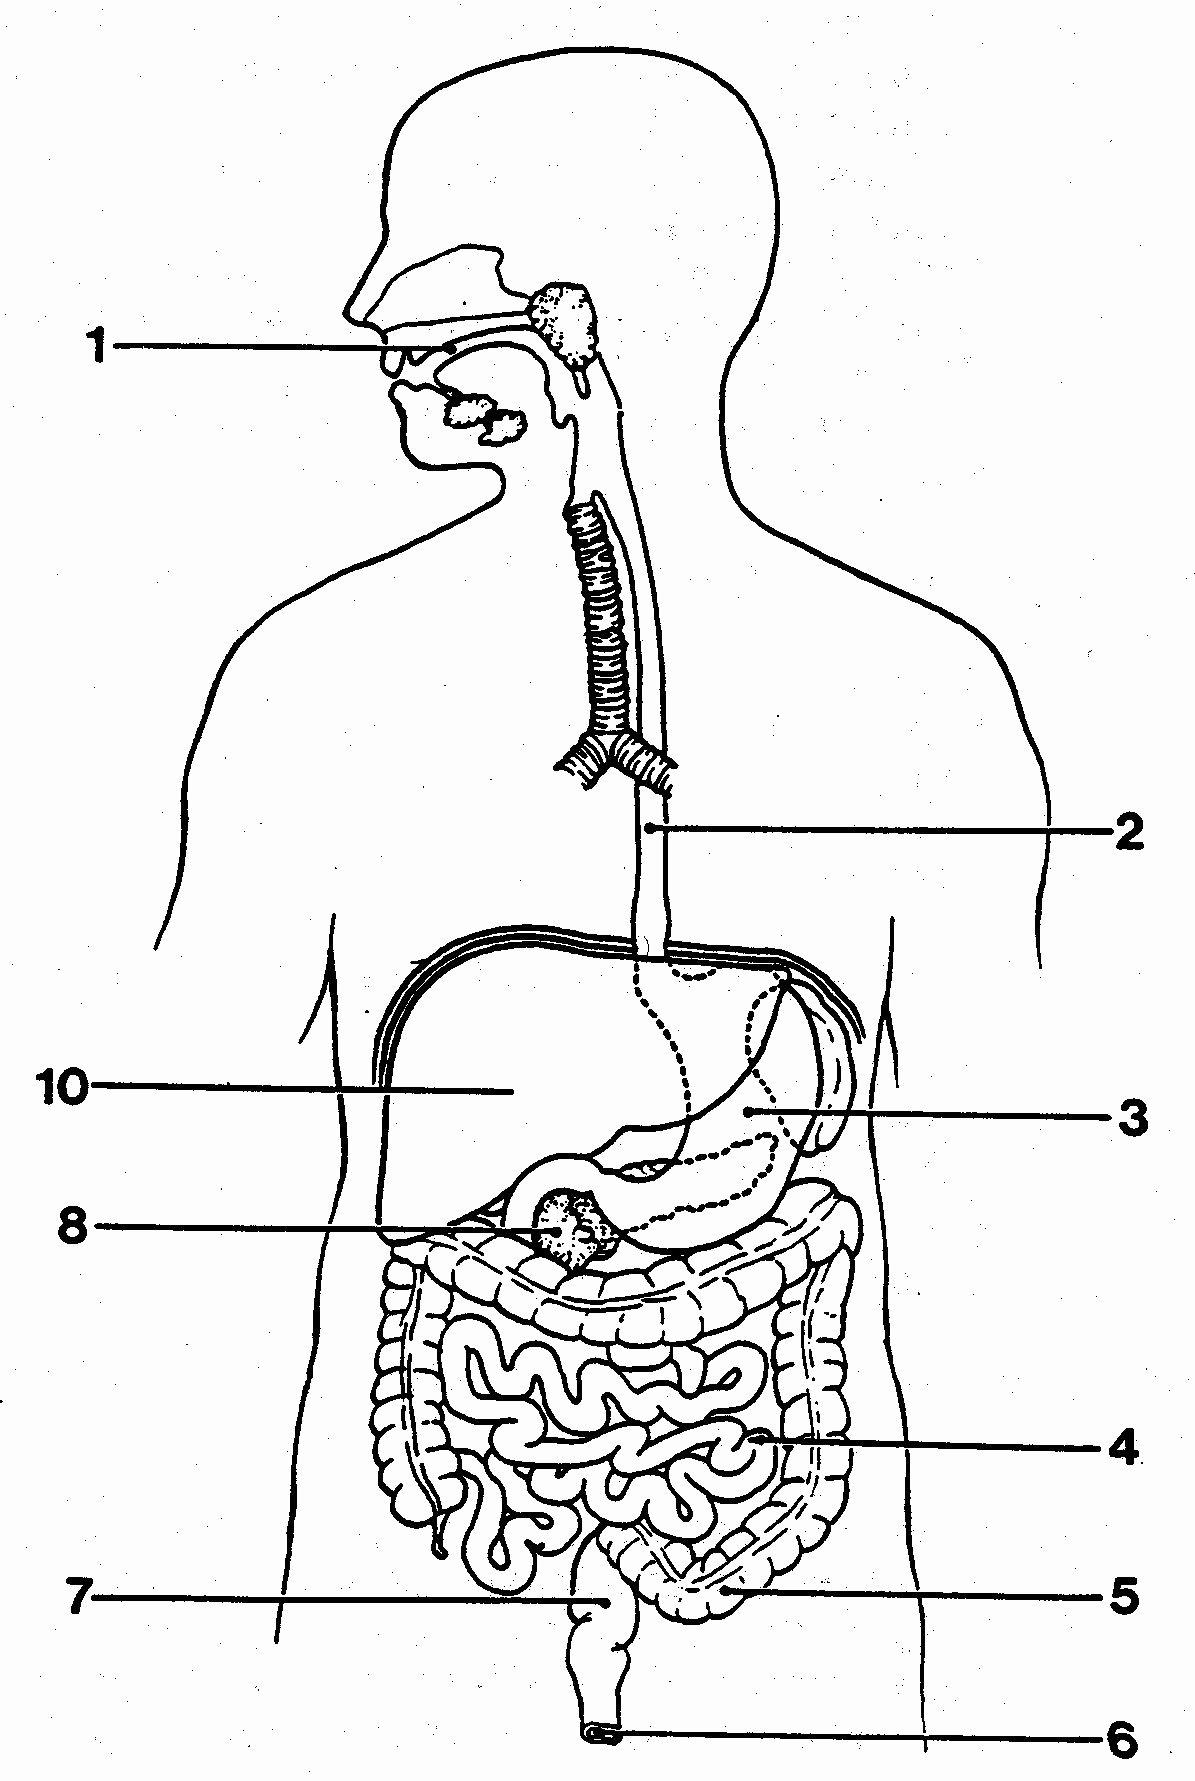 Digestive System Worksheets Middle School Best Of Best solutions Digestive System Worksheets Collections